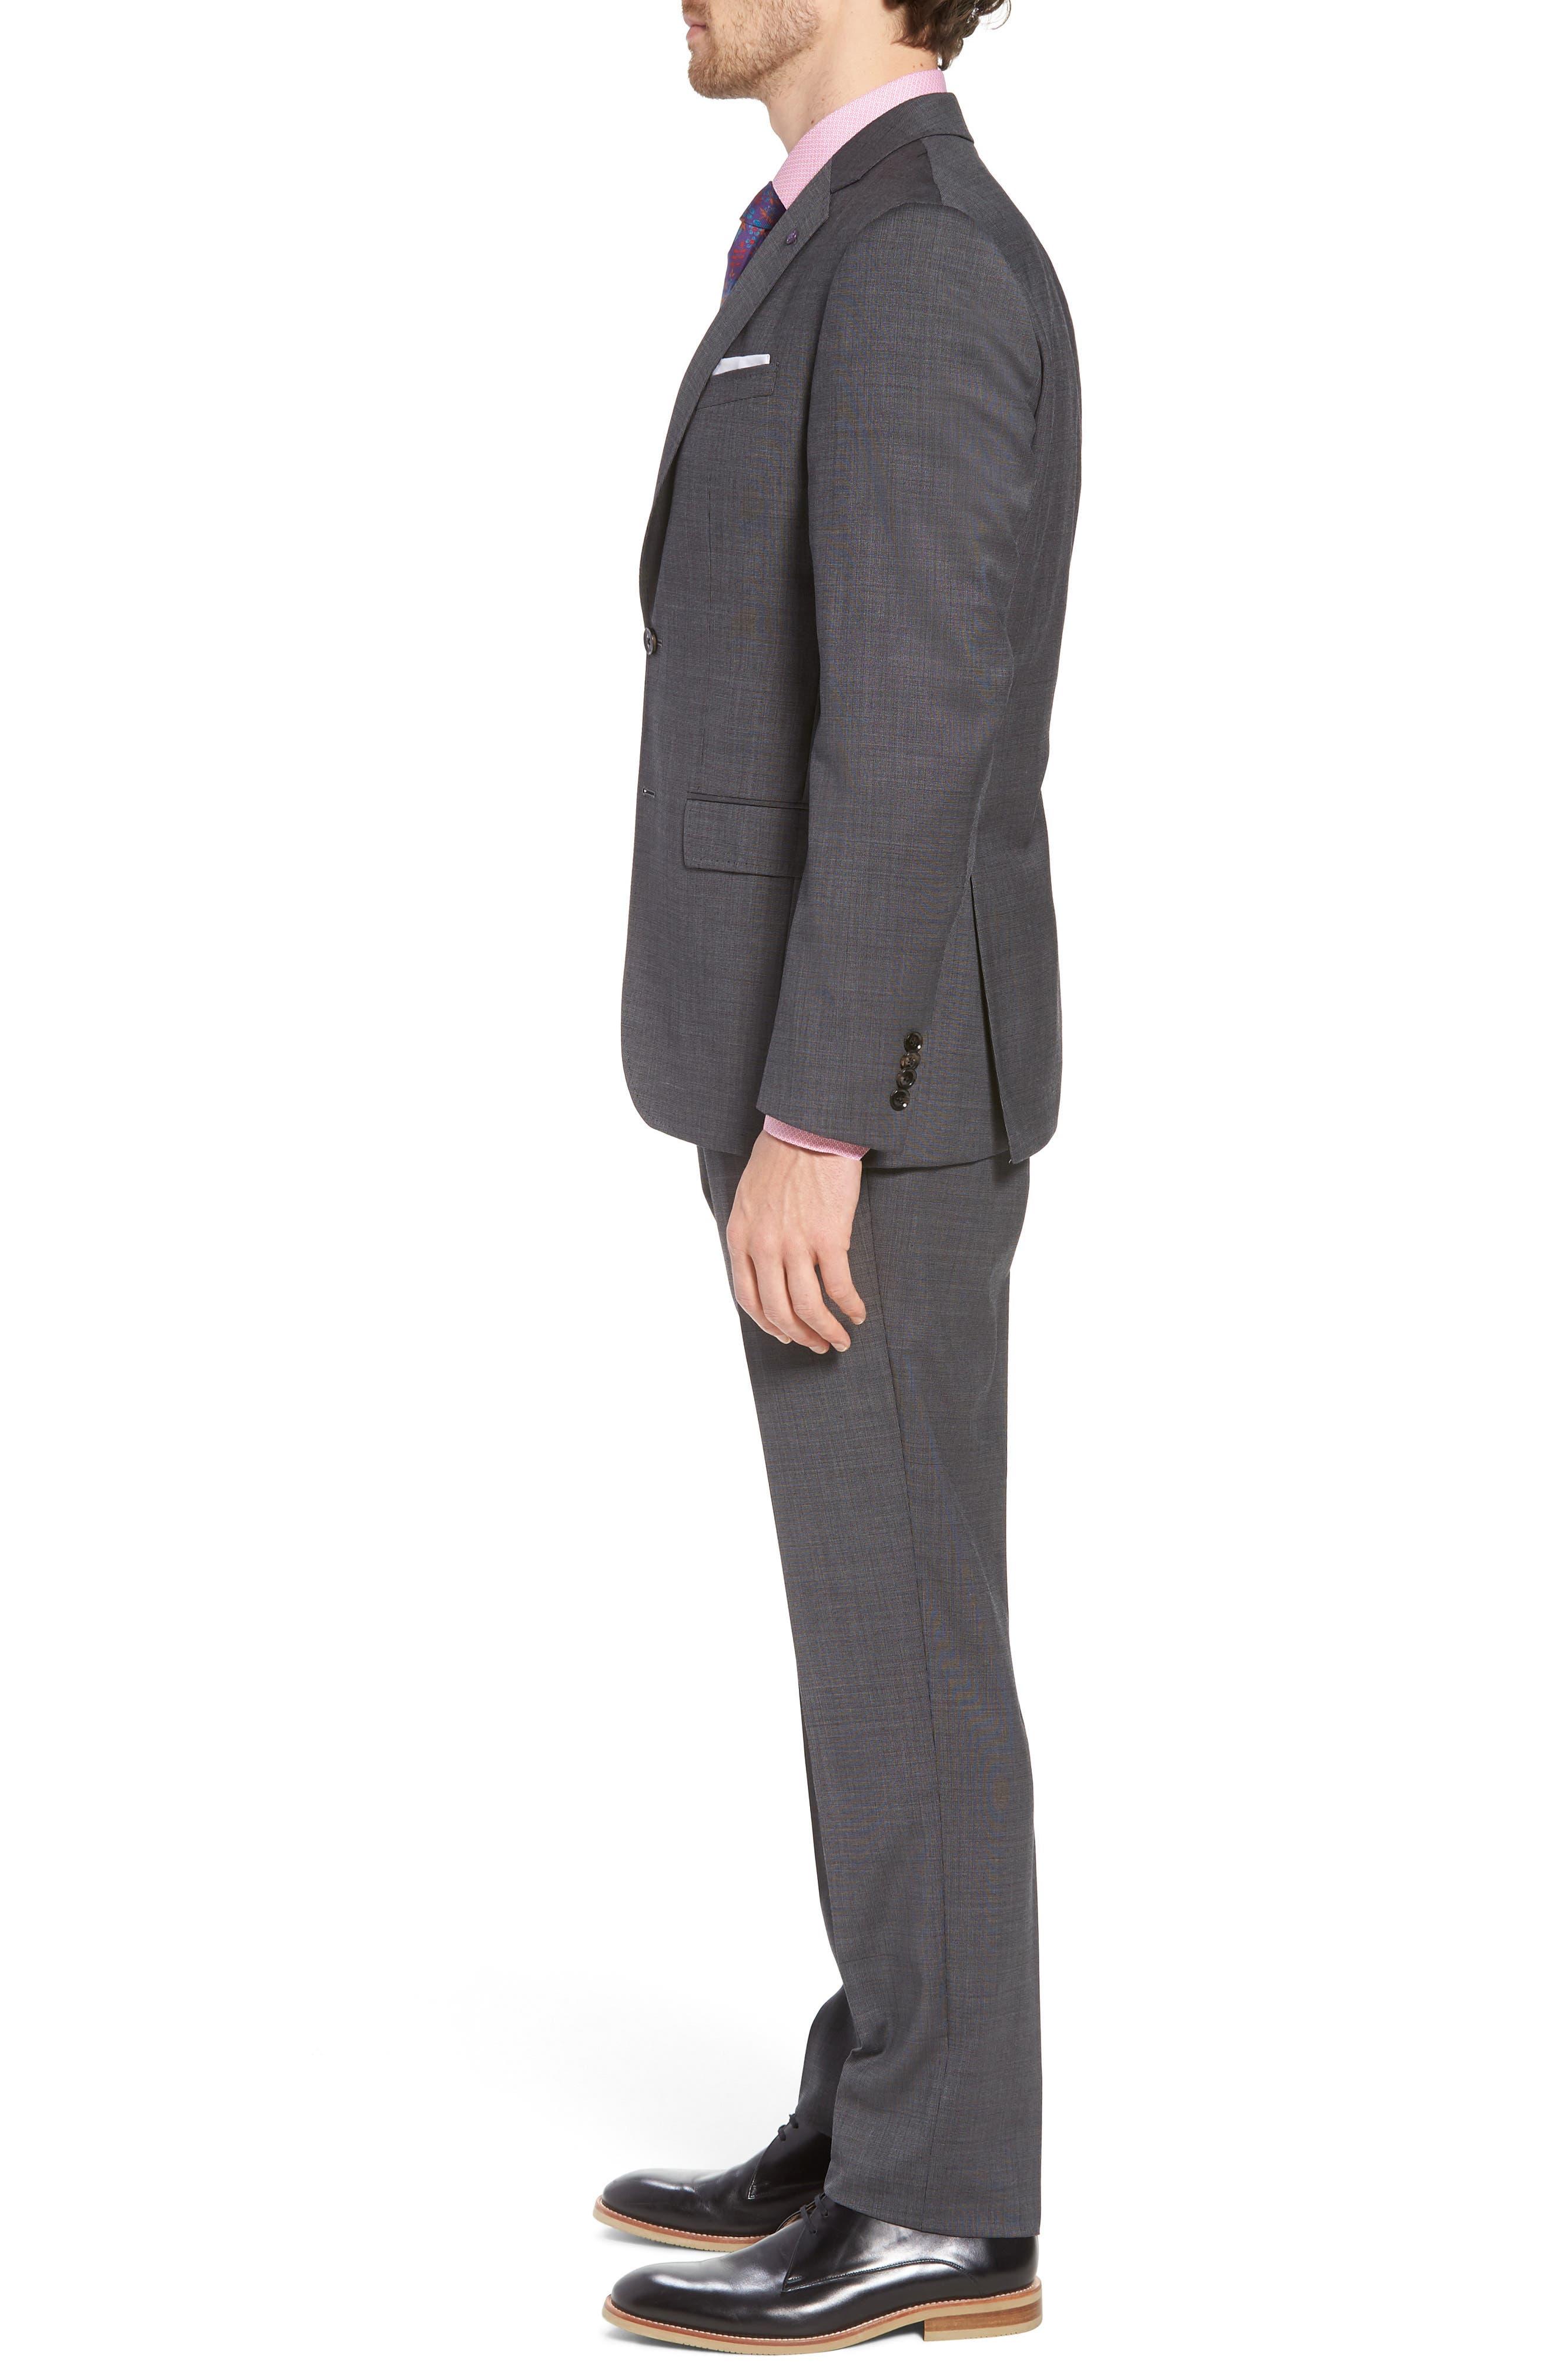 Jay Trim Fit Solid Wool Suit,                             Alternate thumbnail 3, color,                             020